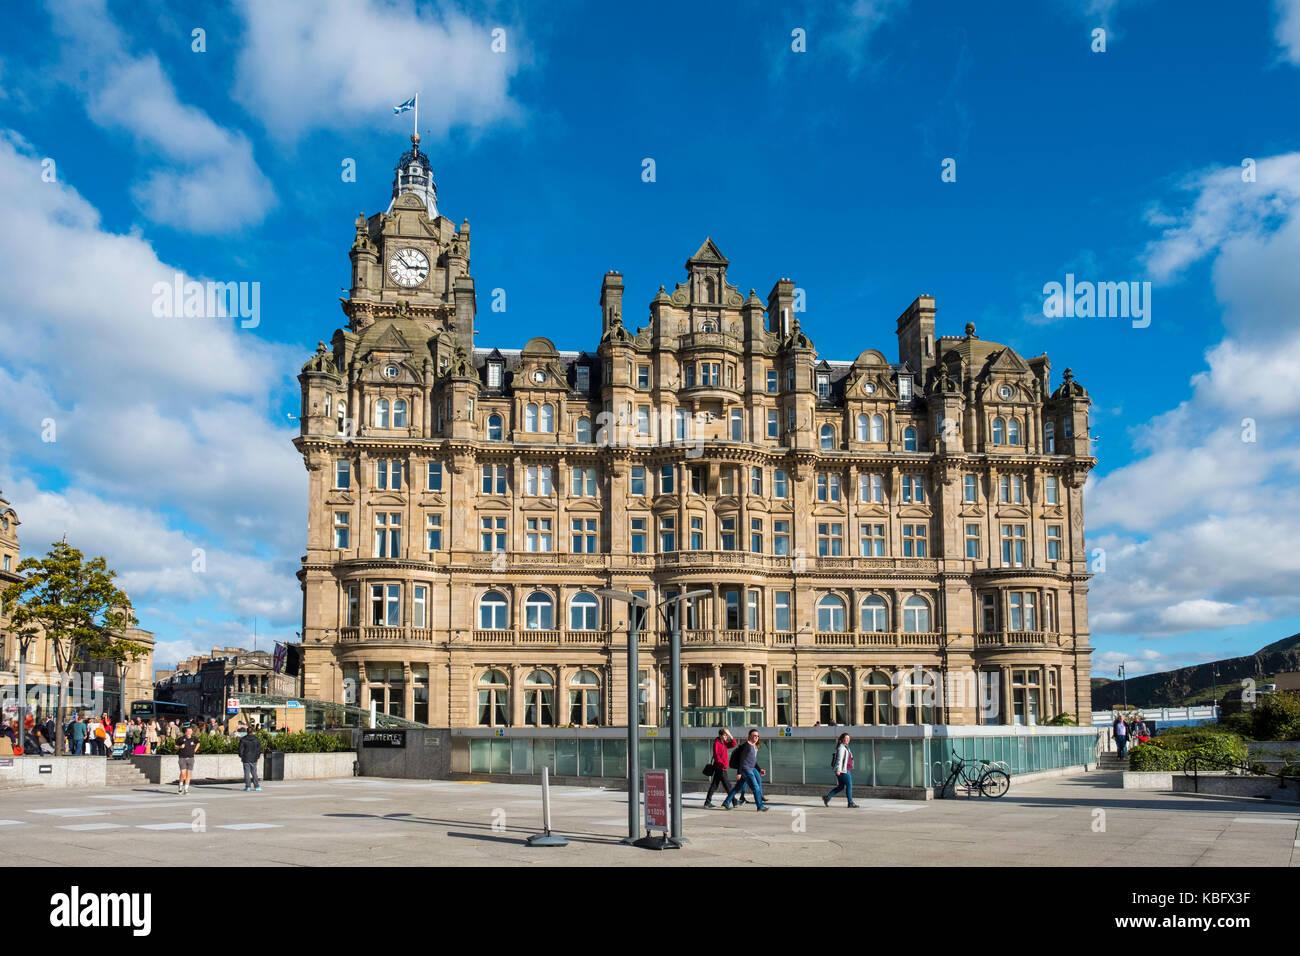 View Of Luxury Balmoral Hotel On Princes Street In Edinburgh